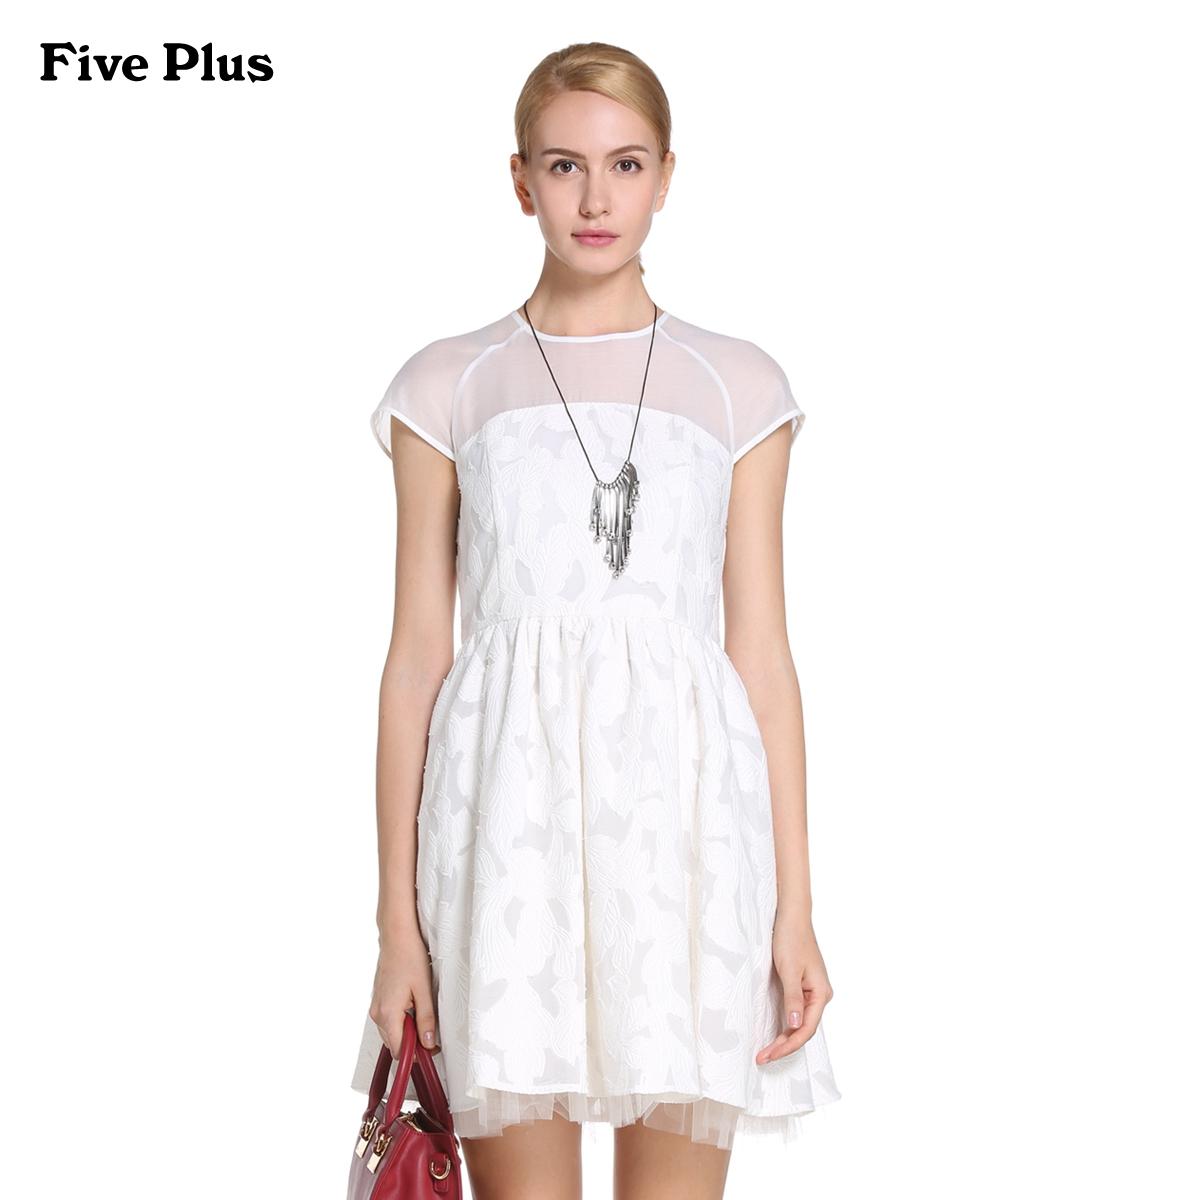 Five Plus新女装雪纺拼接透视圆领短袖高腰连衣裙2HL3080210